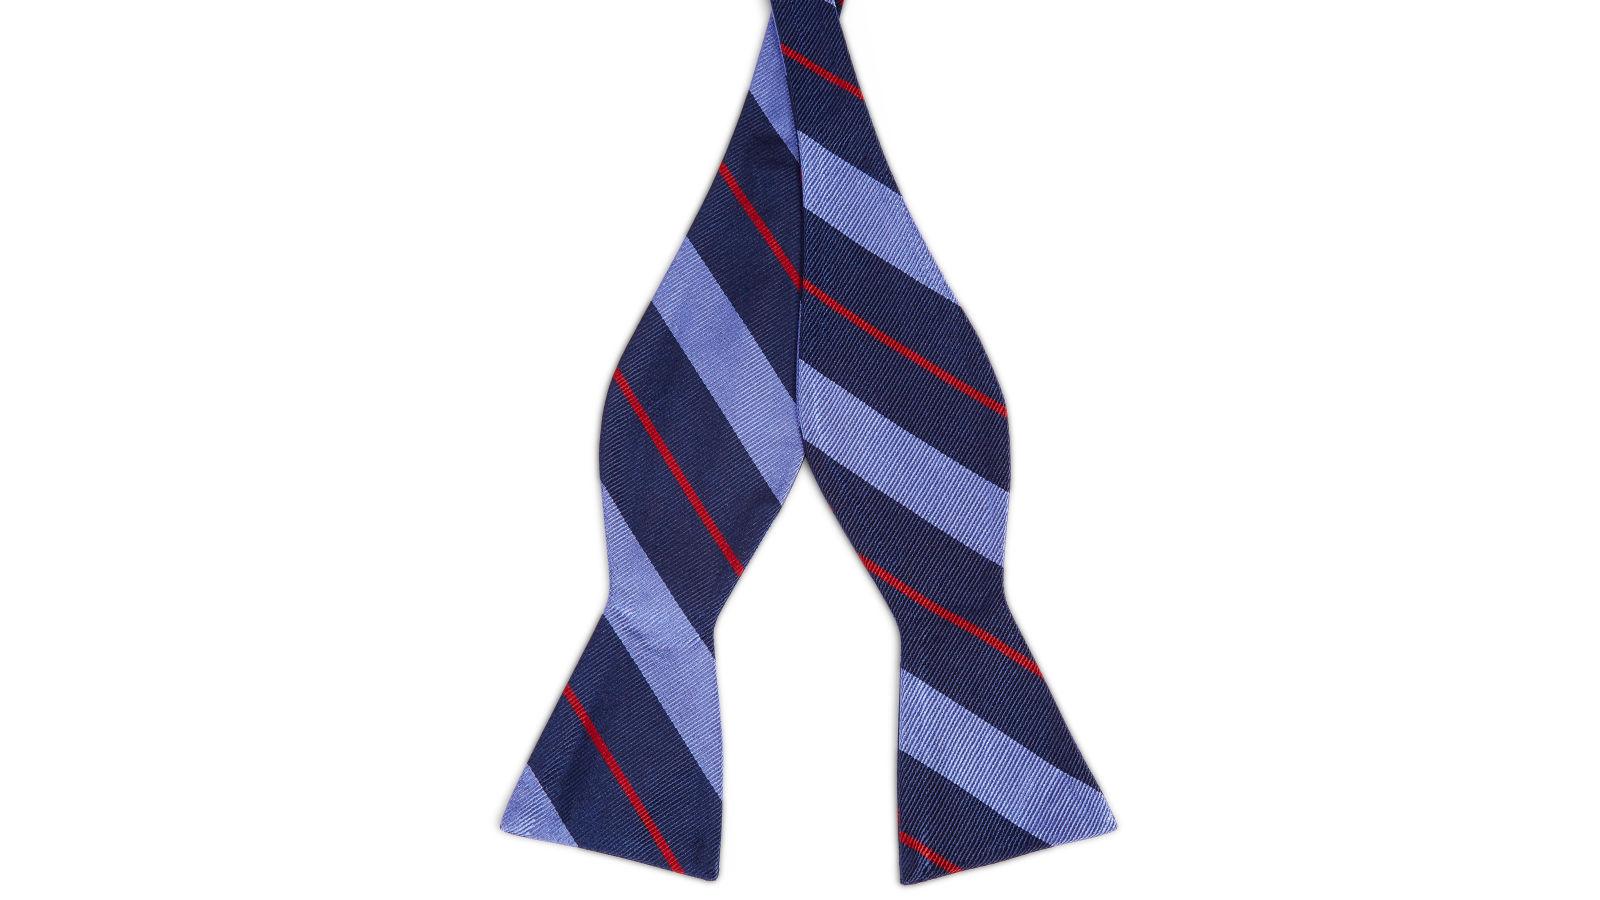 e7d5738d397 Παστέλ Μπλε & Κόκκινο & Navy Μπλε Ριγέ Μεταξωτό Δετό Παπιγιόν | Σε απόθεμα!  | TND Basics